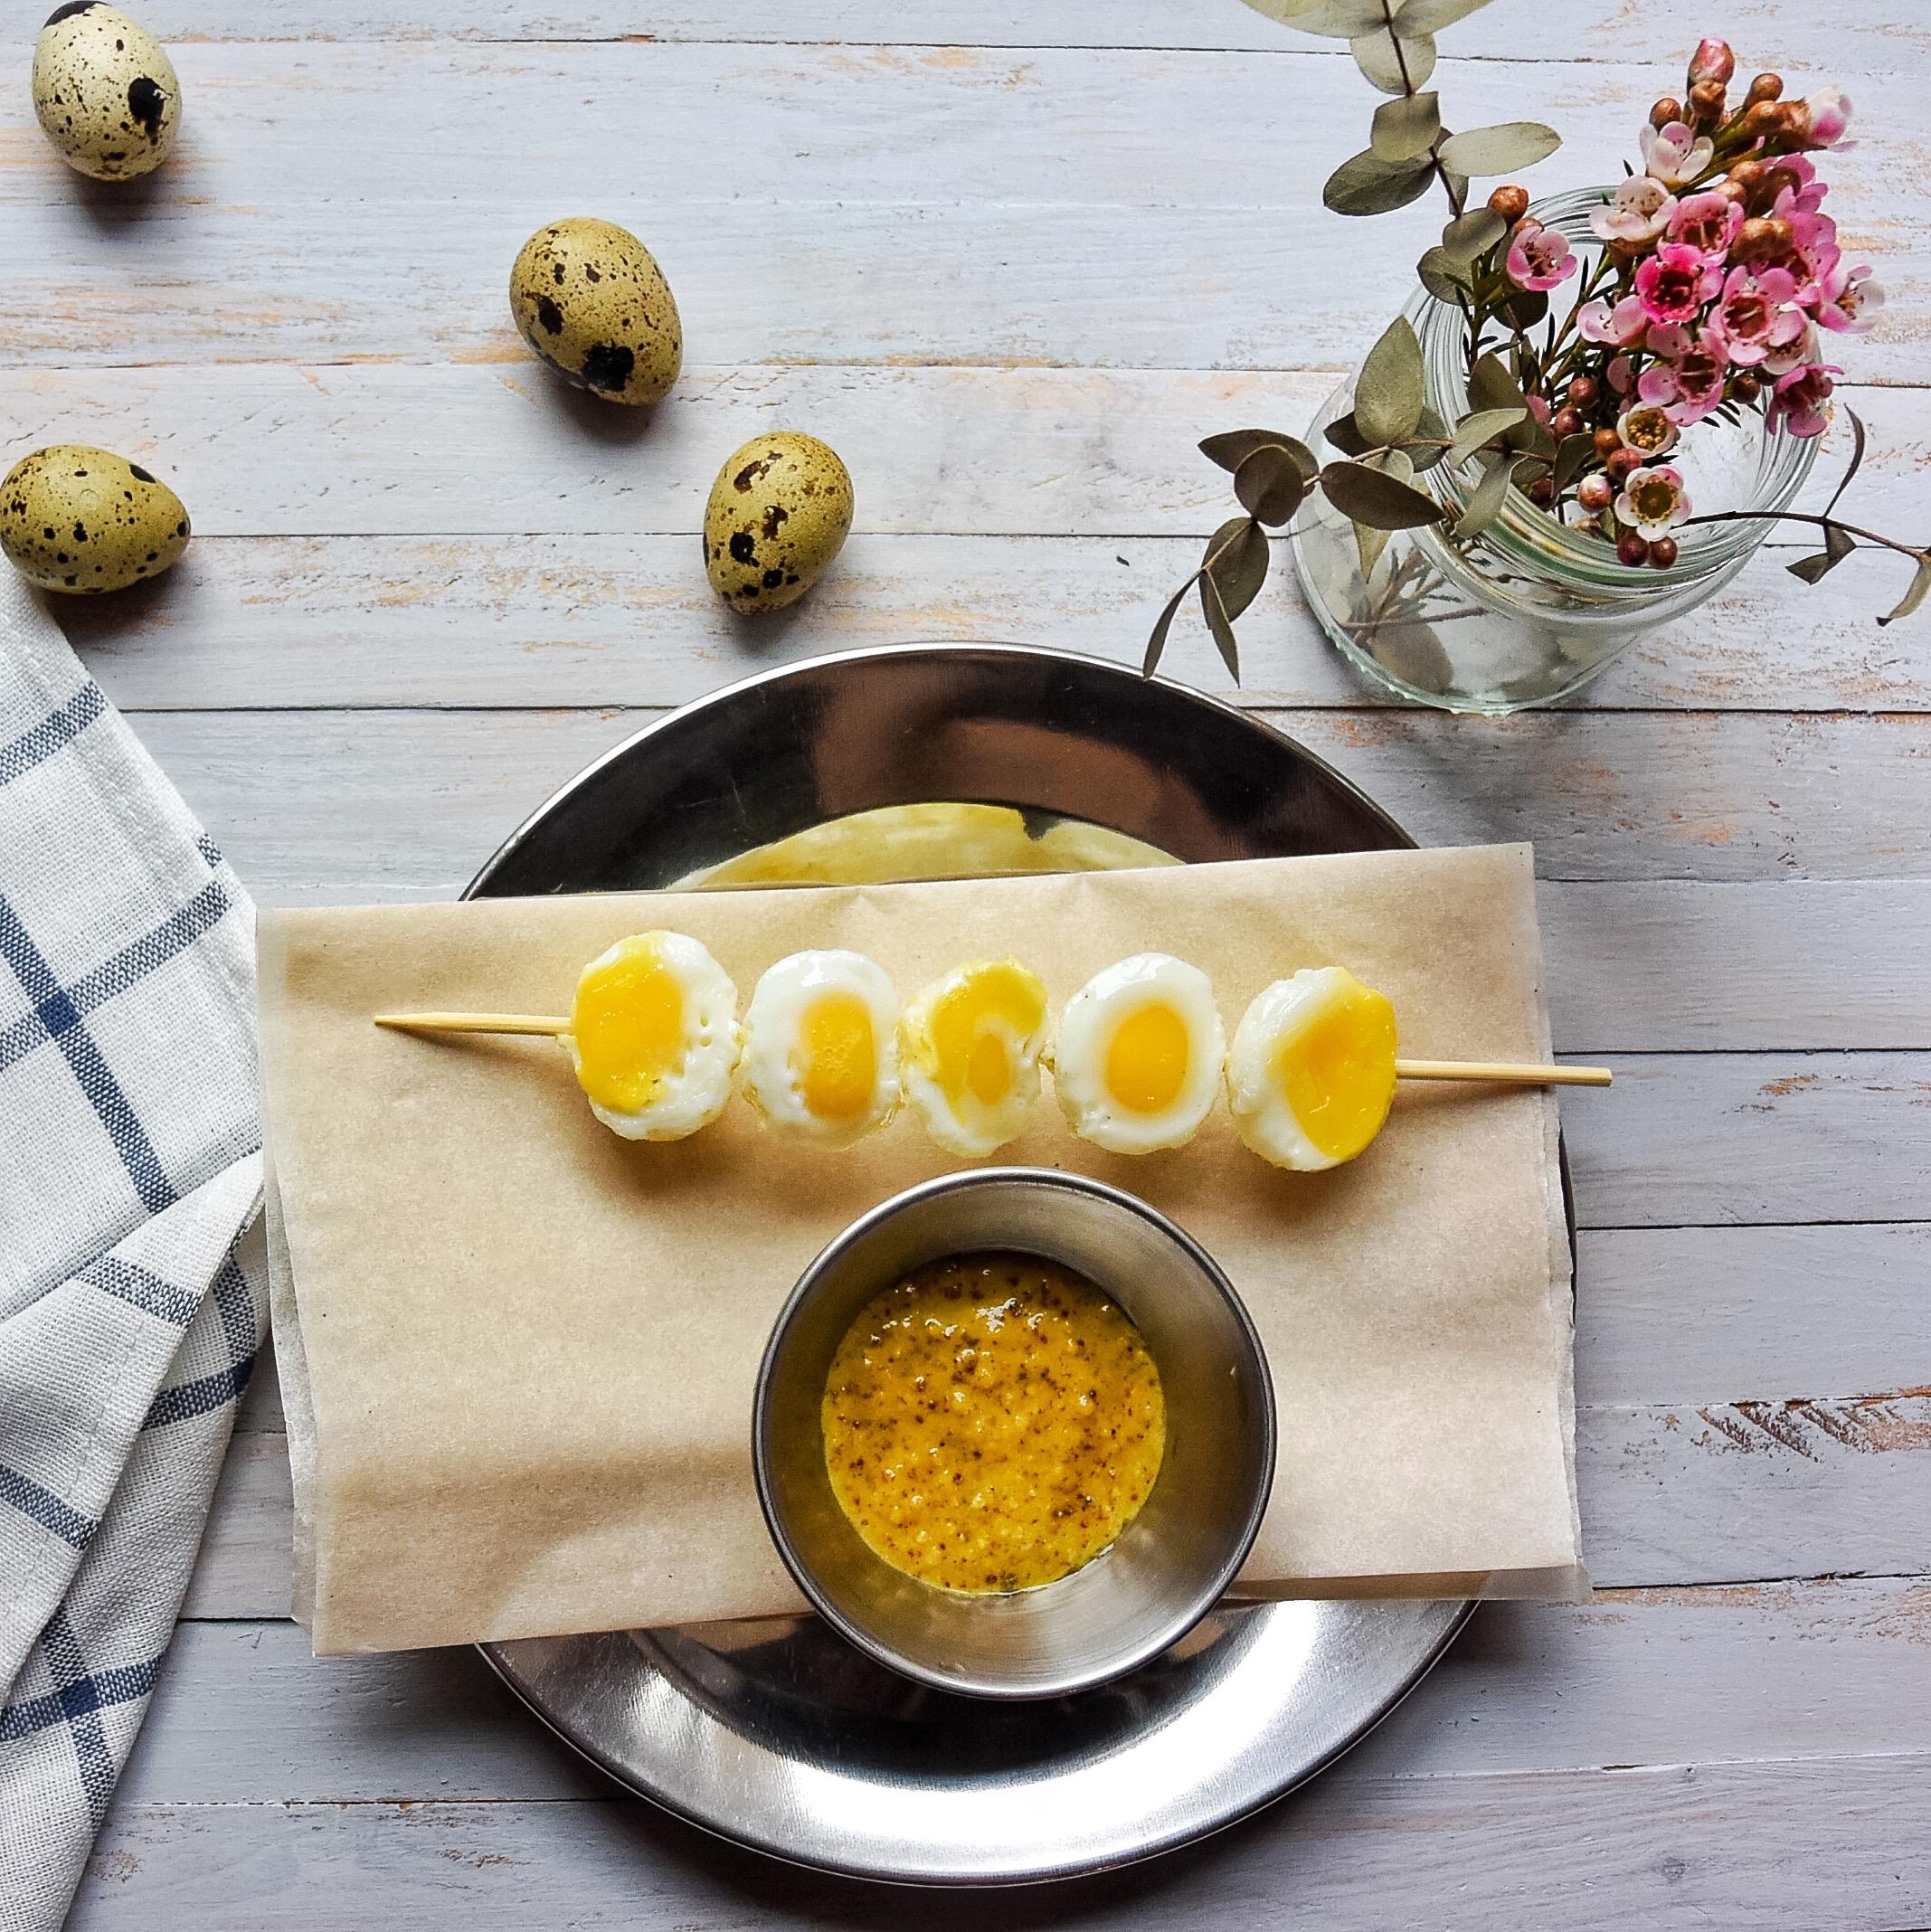 Shonkel Eggs